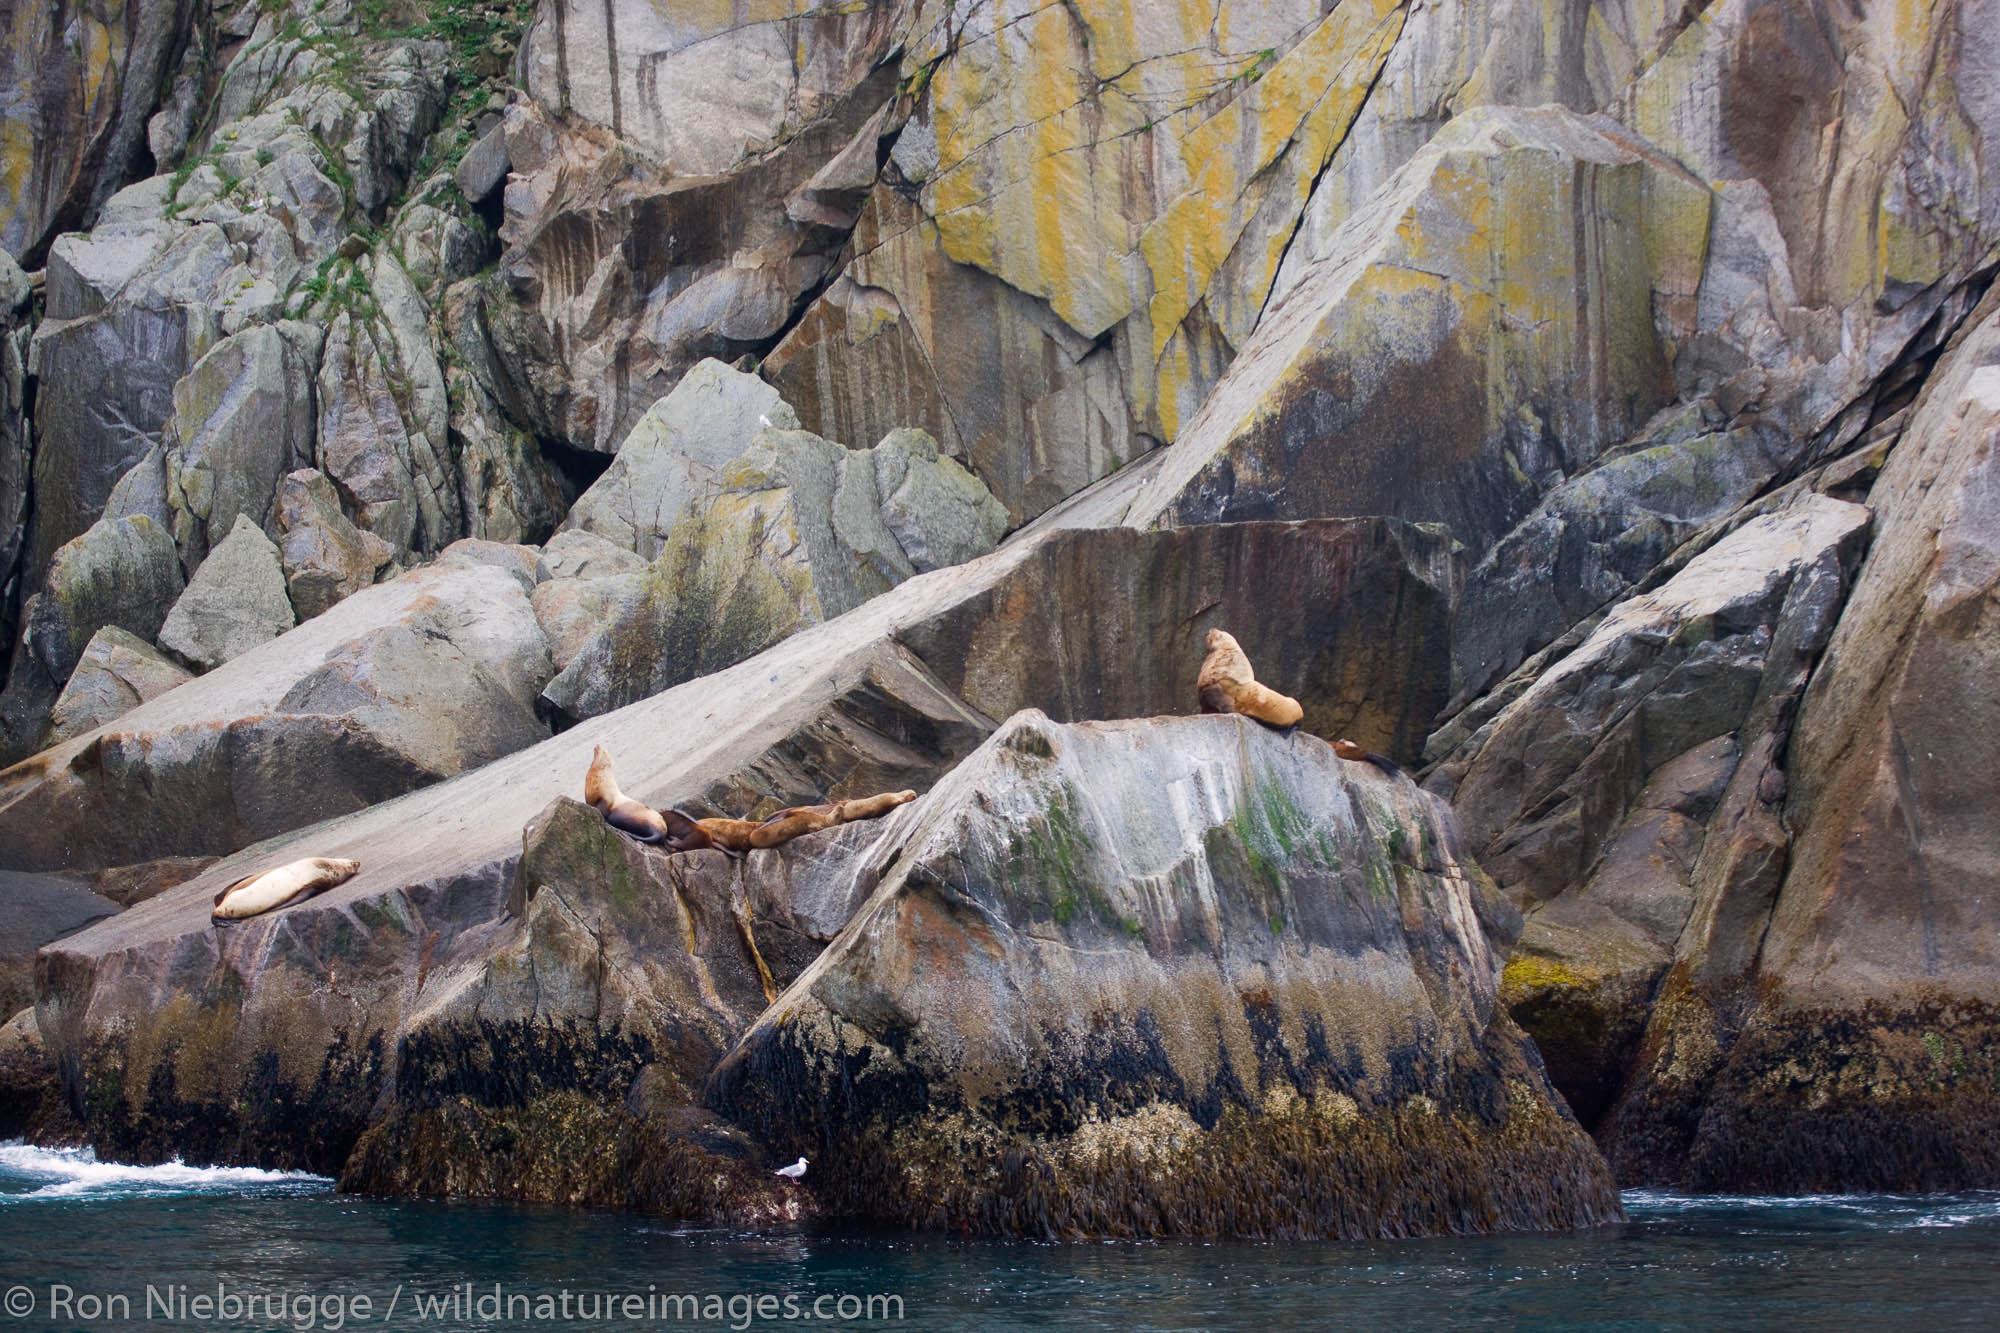 Steller Sea Lions on a haul-out, Kenai Fjords National Park, Alaska.